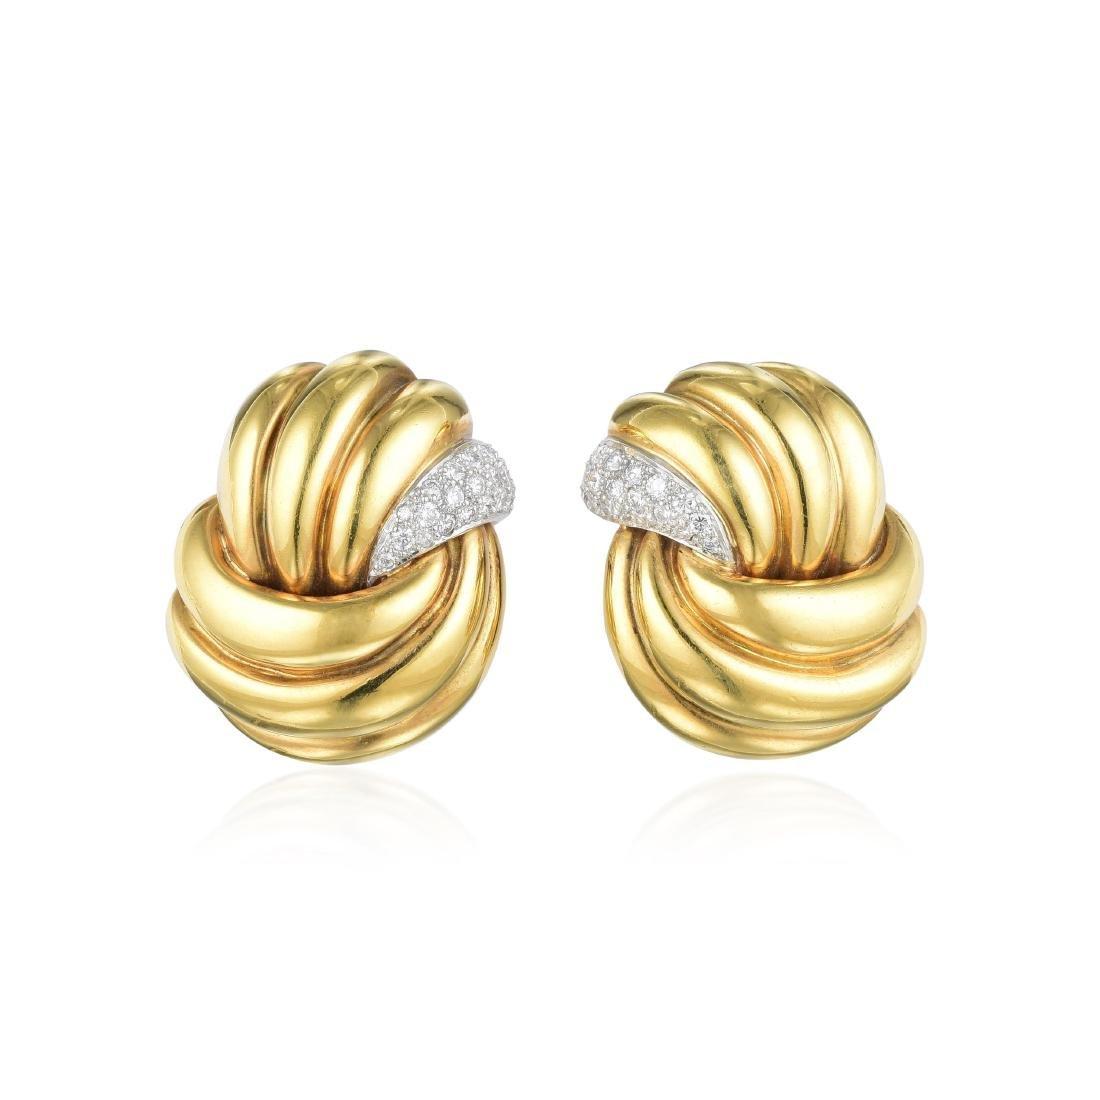 Verdura Gold and Diamond Earrings